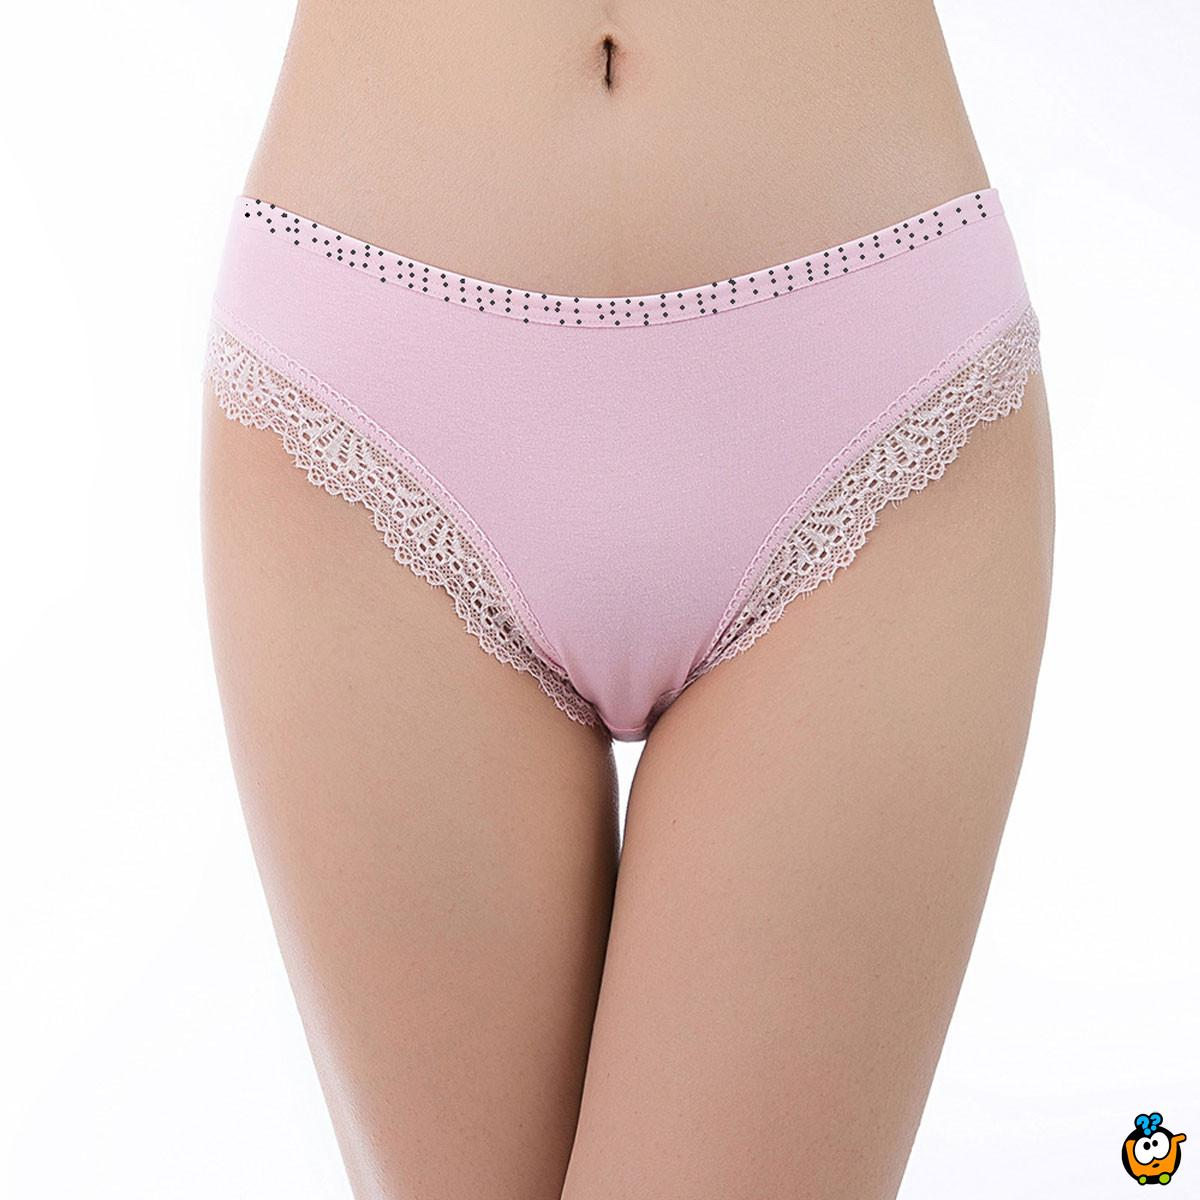 Classic Lace - Plus size ženske gaćice sa čipkom - bela boja